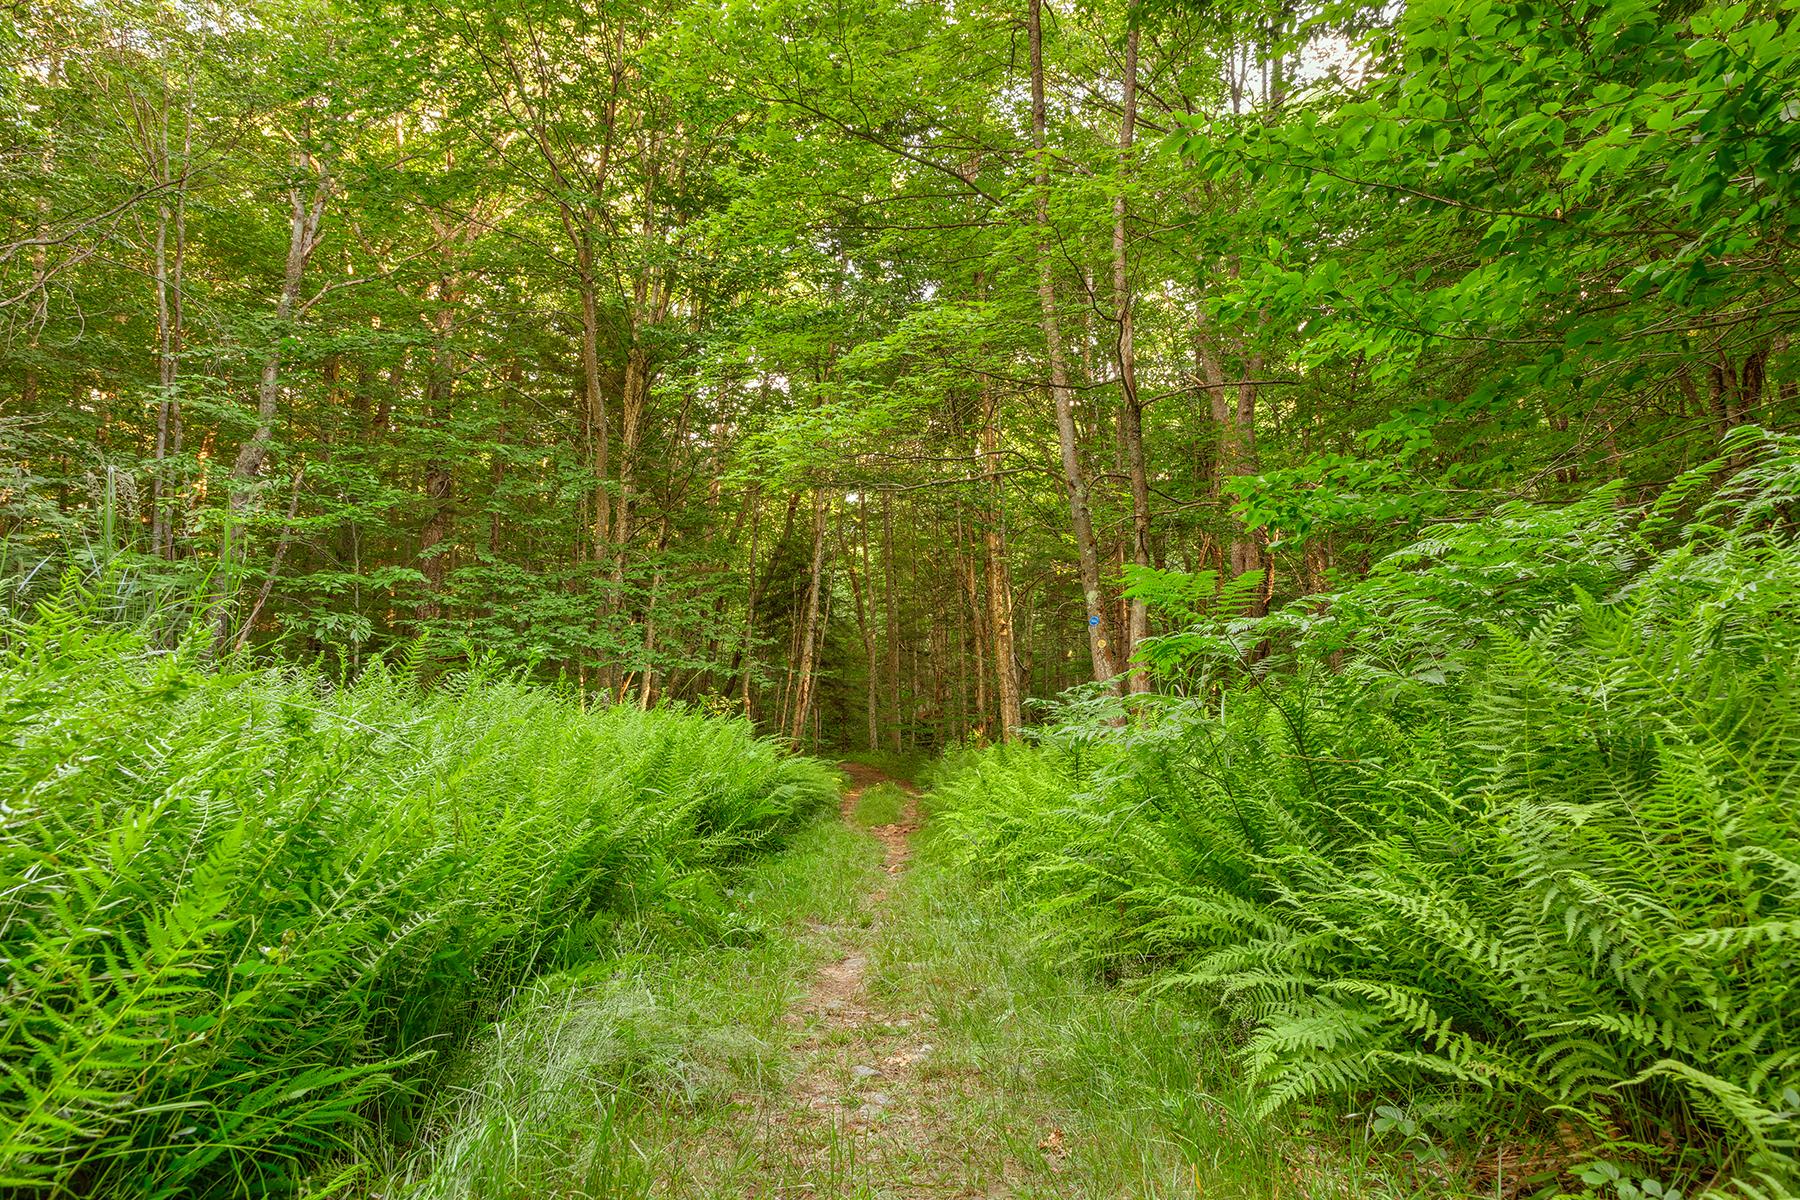 Summer fern trail - hdr photo